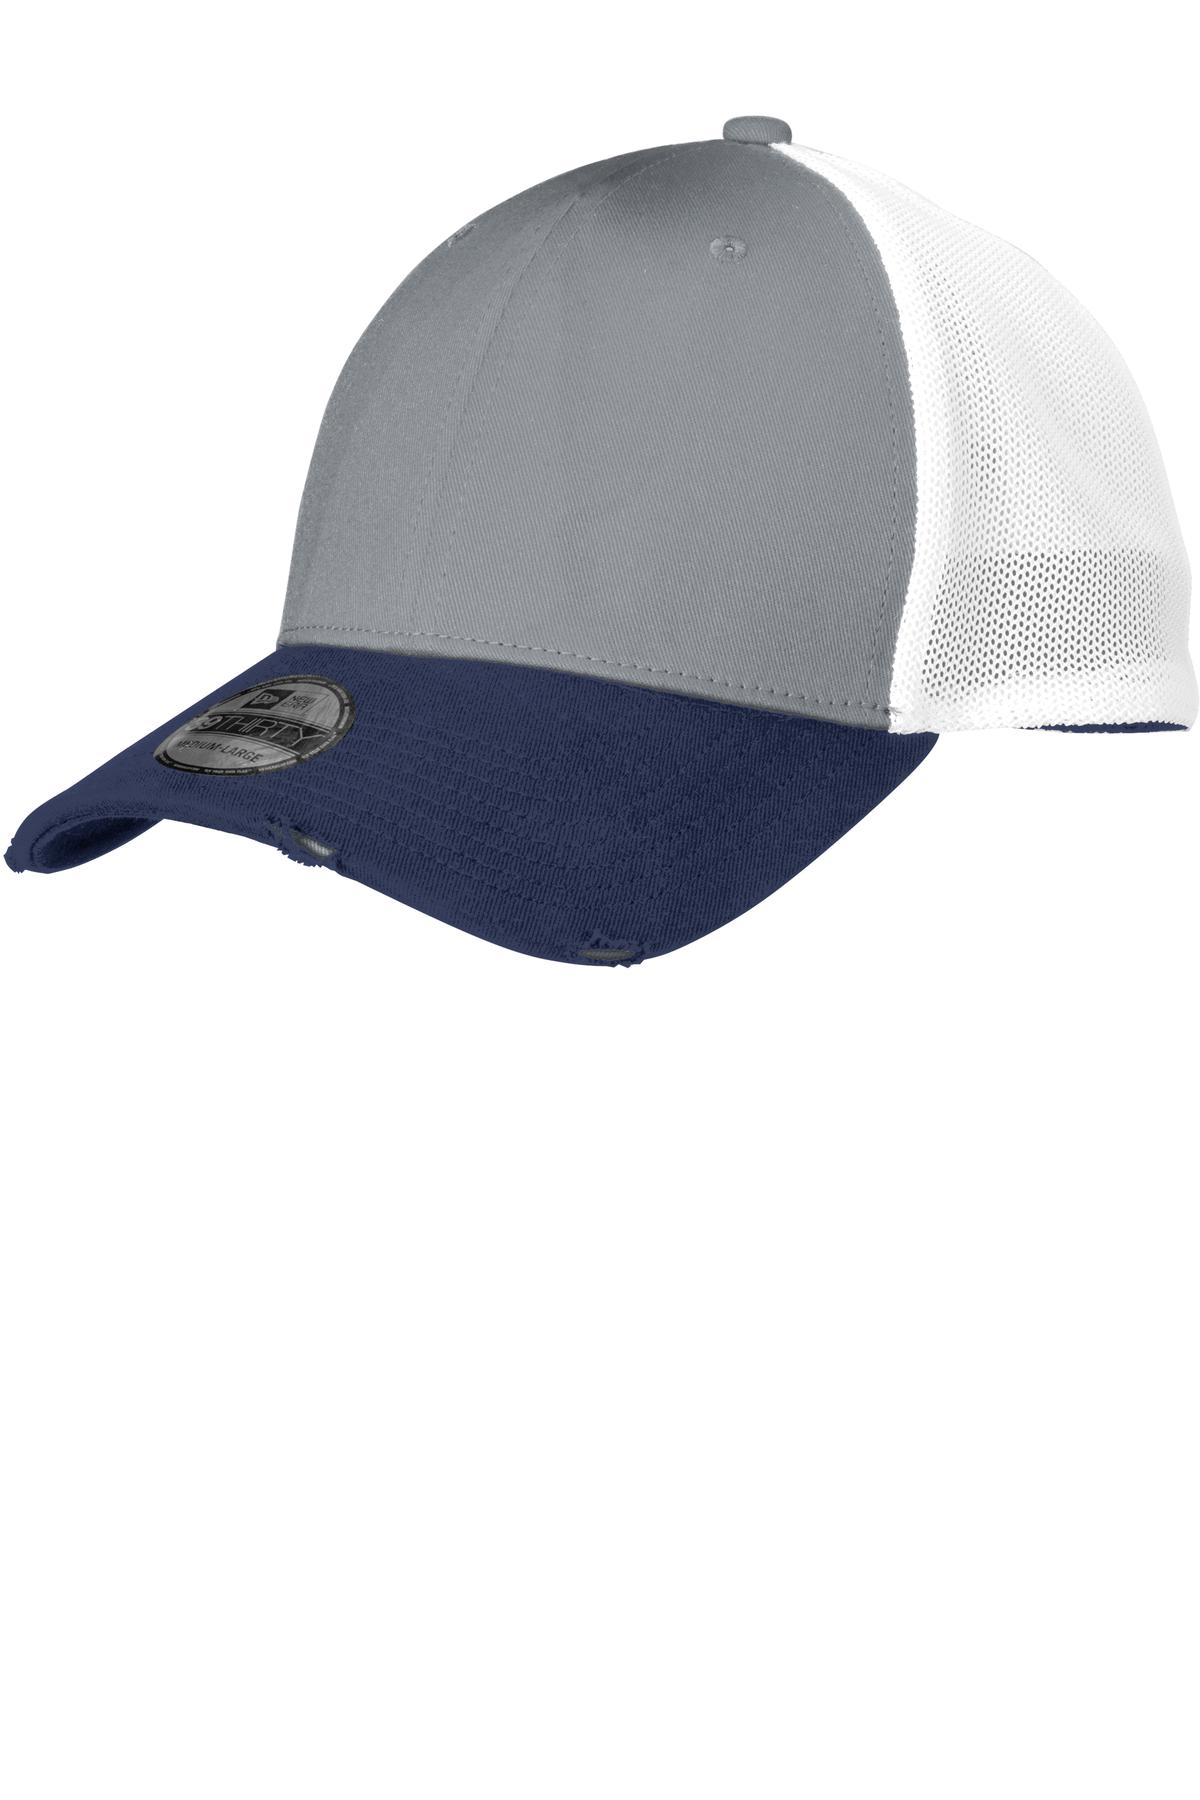 New Era® NE1080 - Vintage Mesh Cap